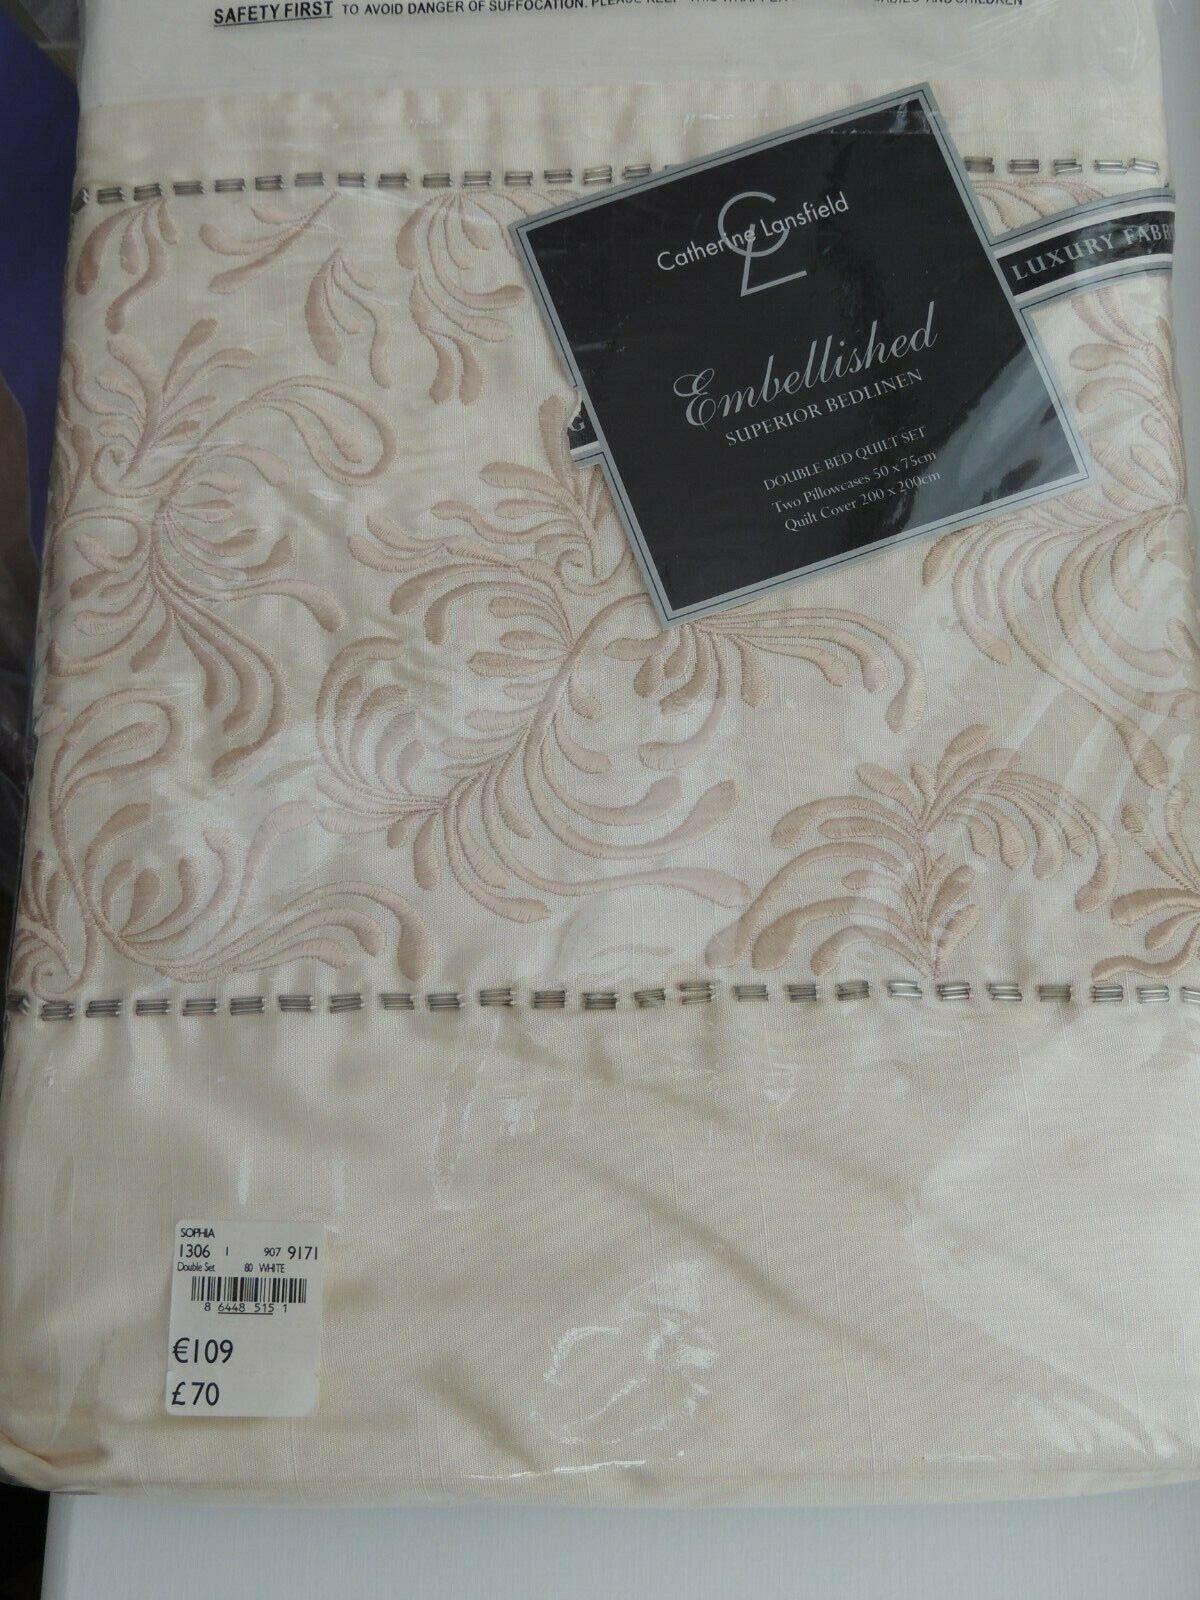 Catherine Lansfield Embellished Superior Bedlinen Double Bed Quilt Set in Sophia